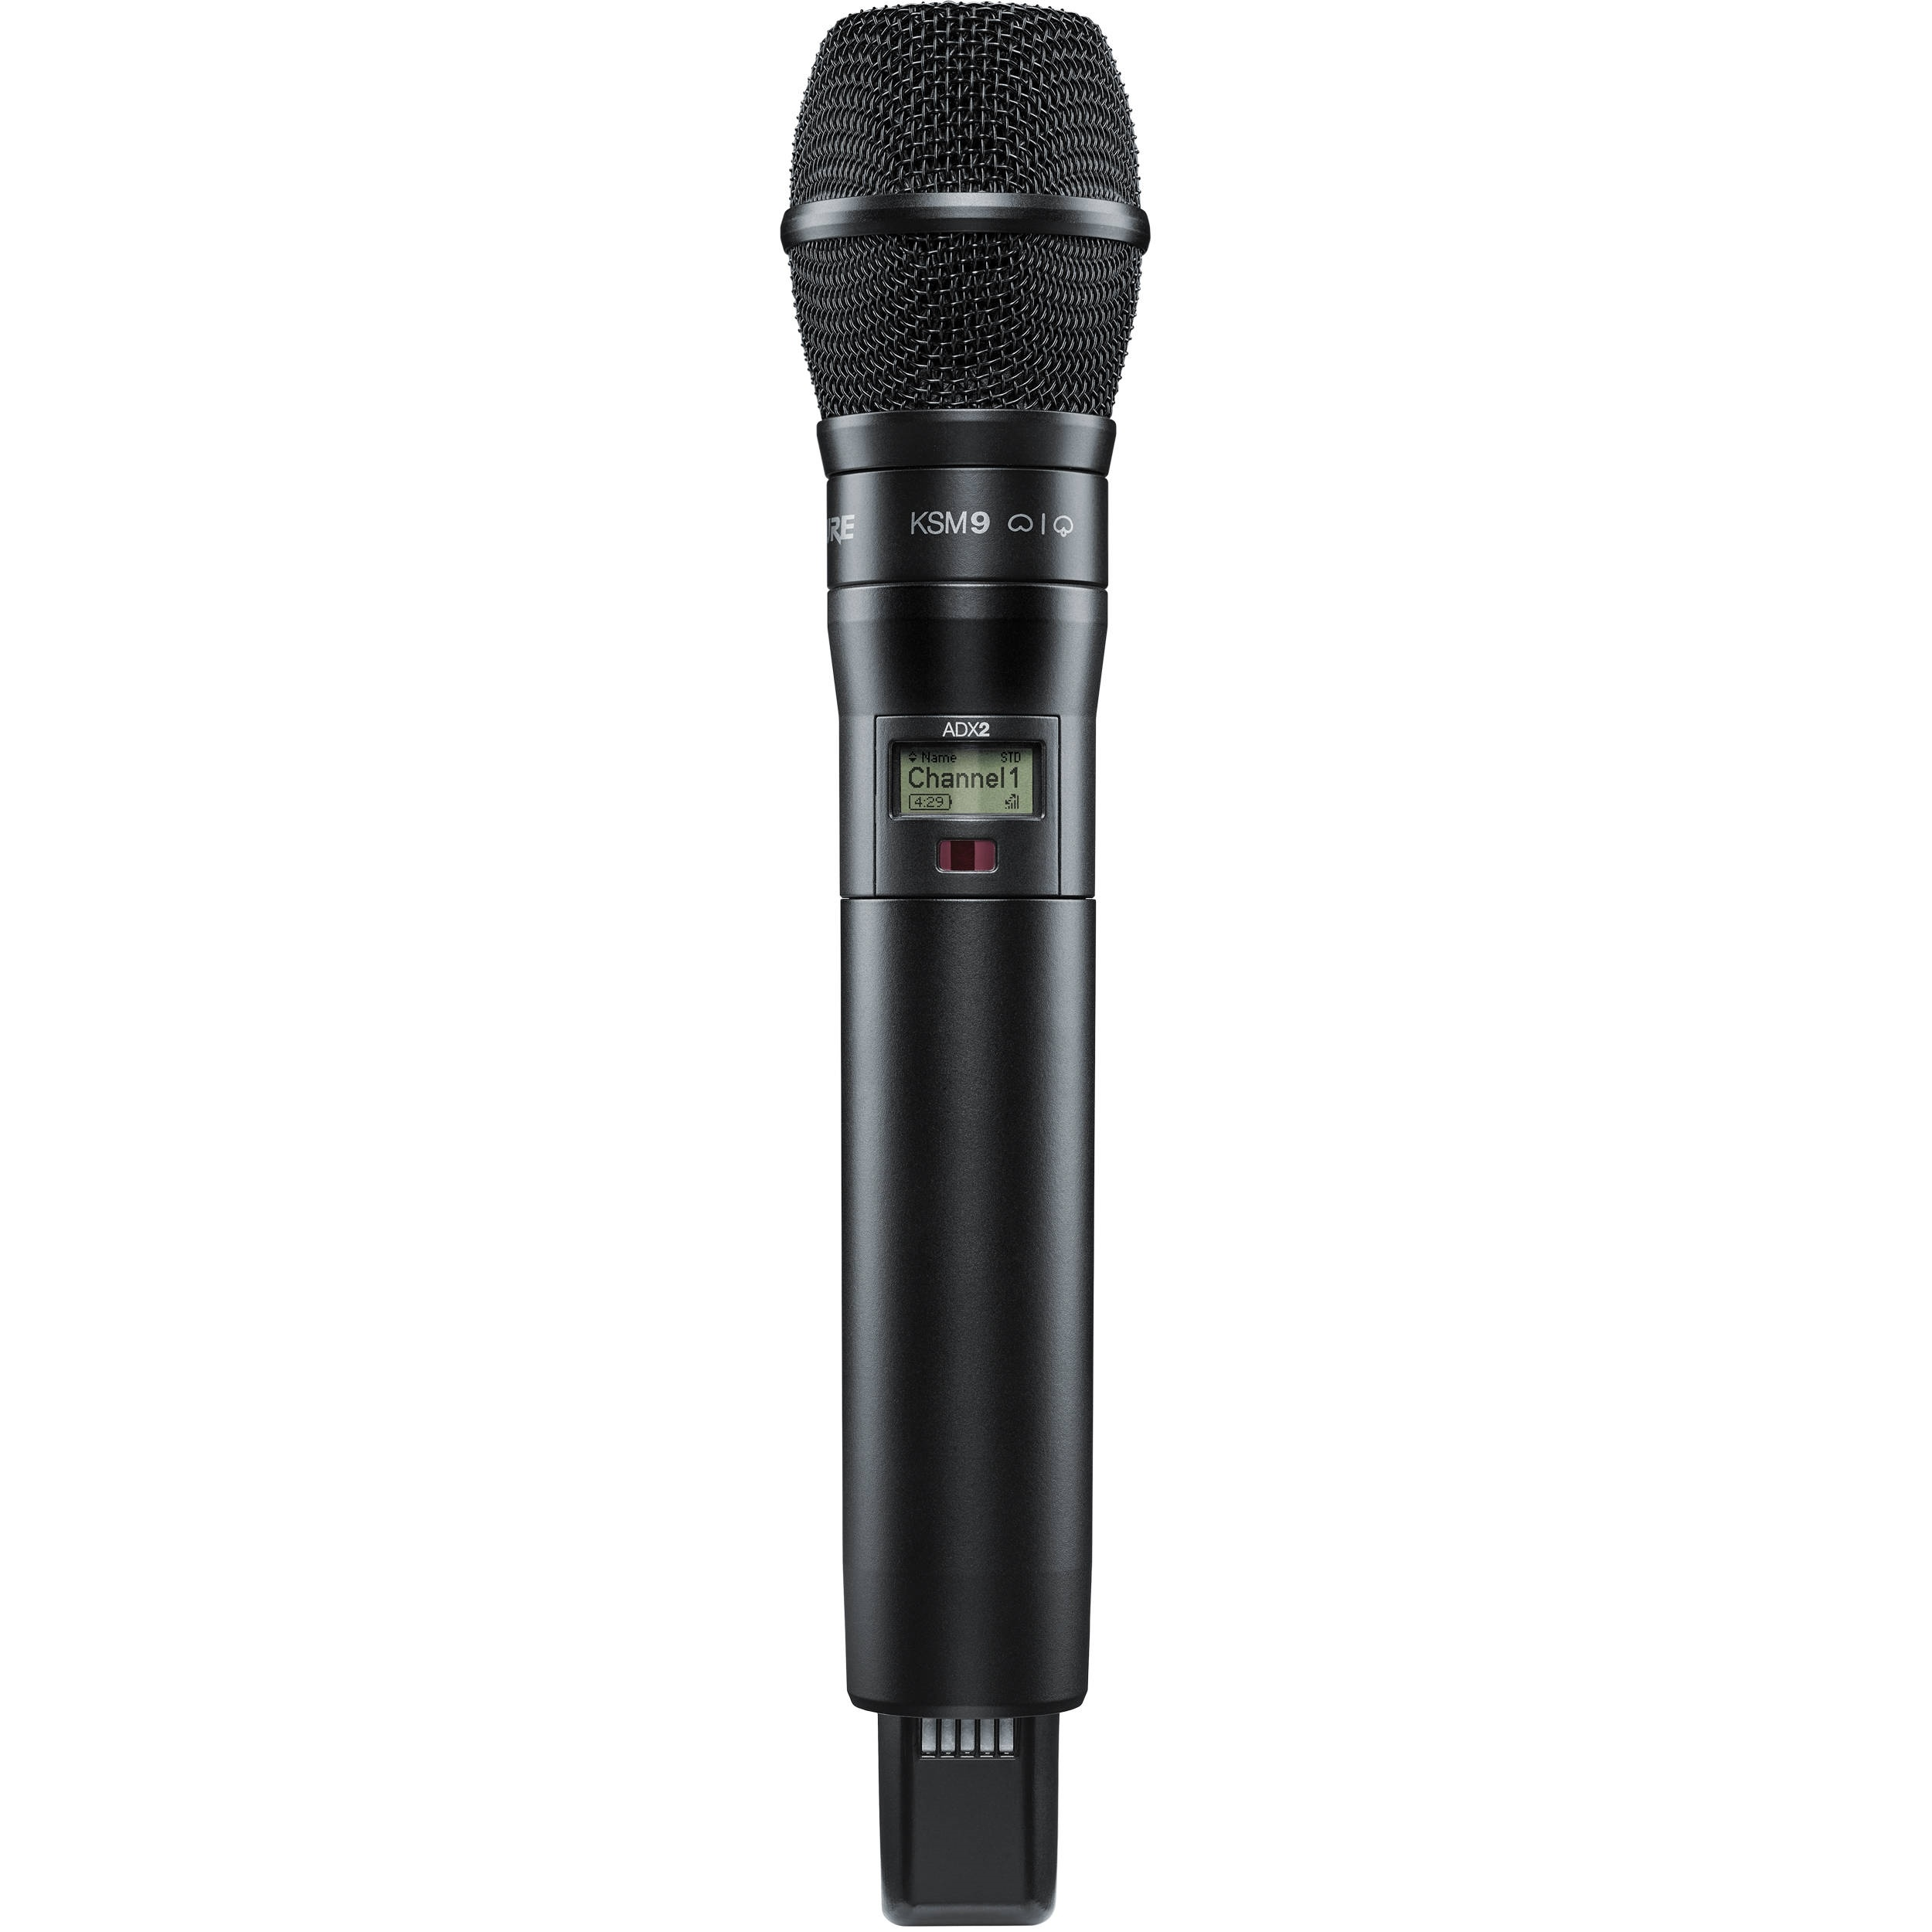 Shure ADX2/K9B Digital Handheld Wireless Microphone Transmitter with KSM9 Capsule